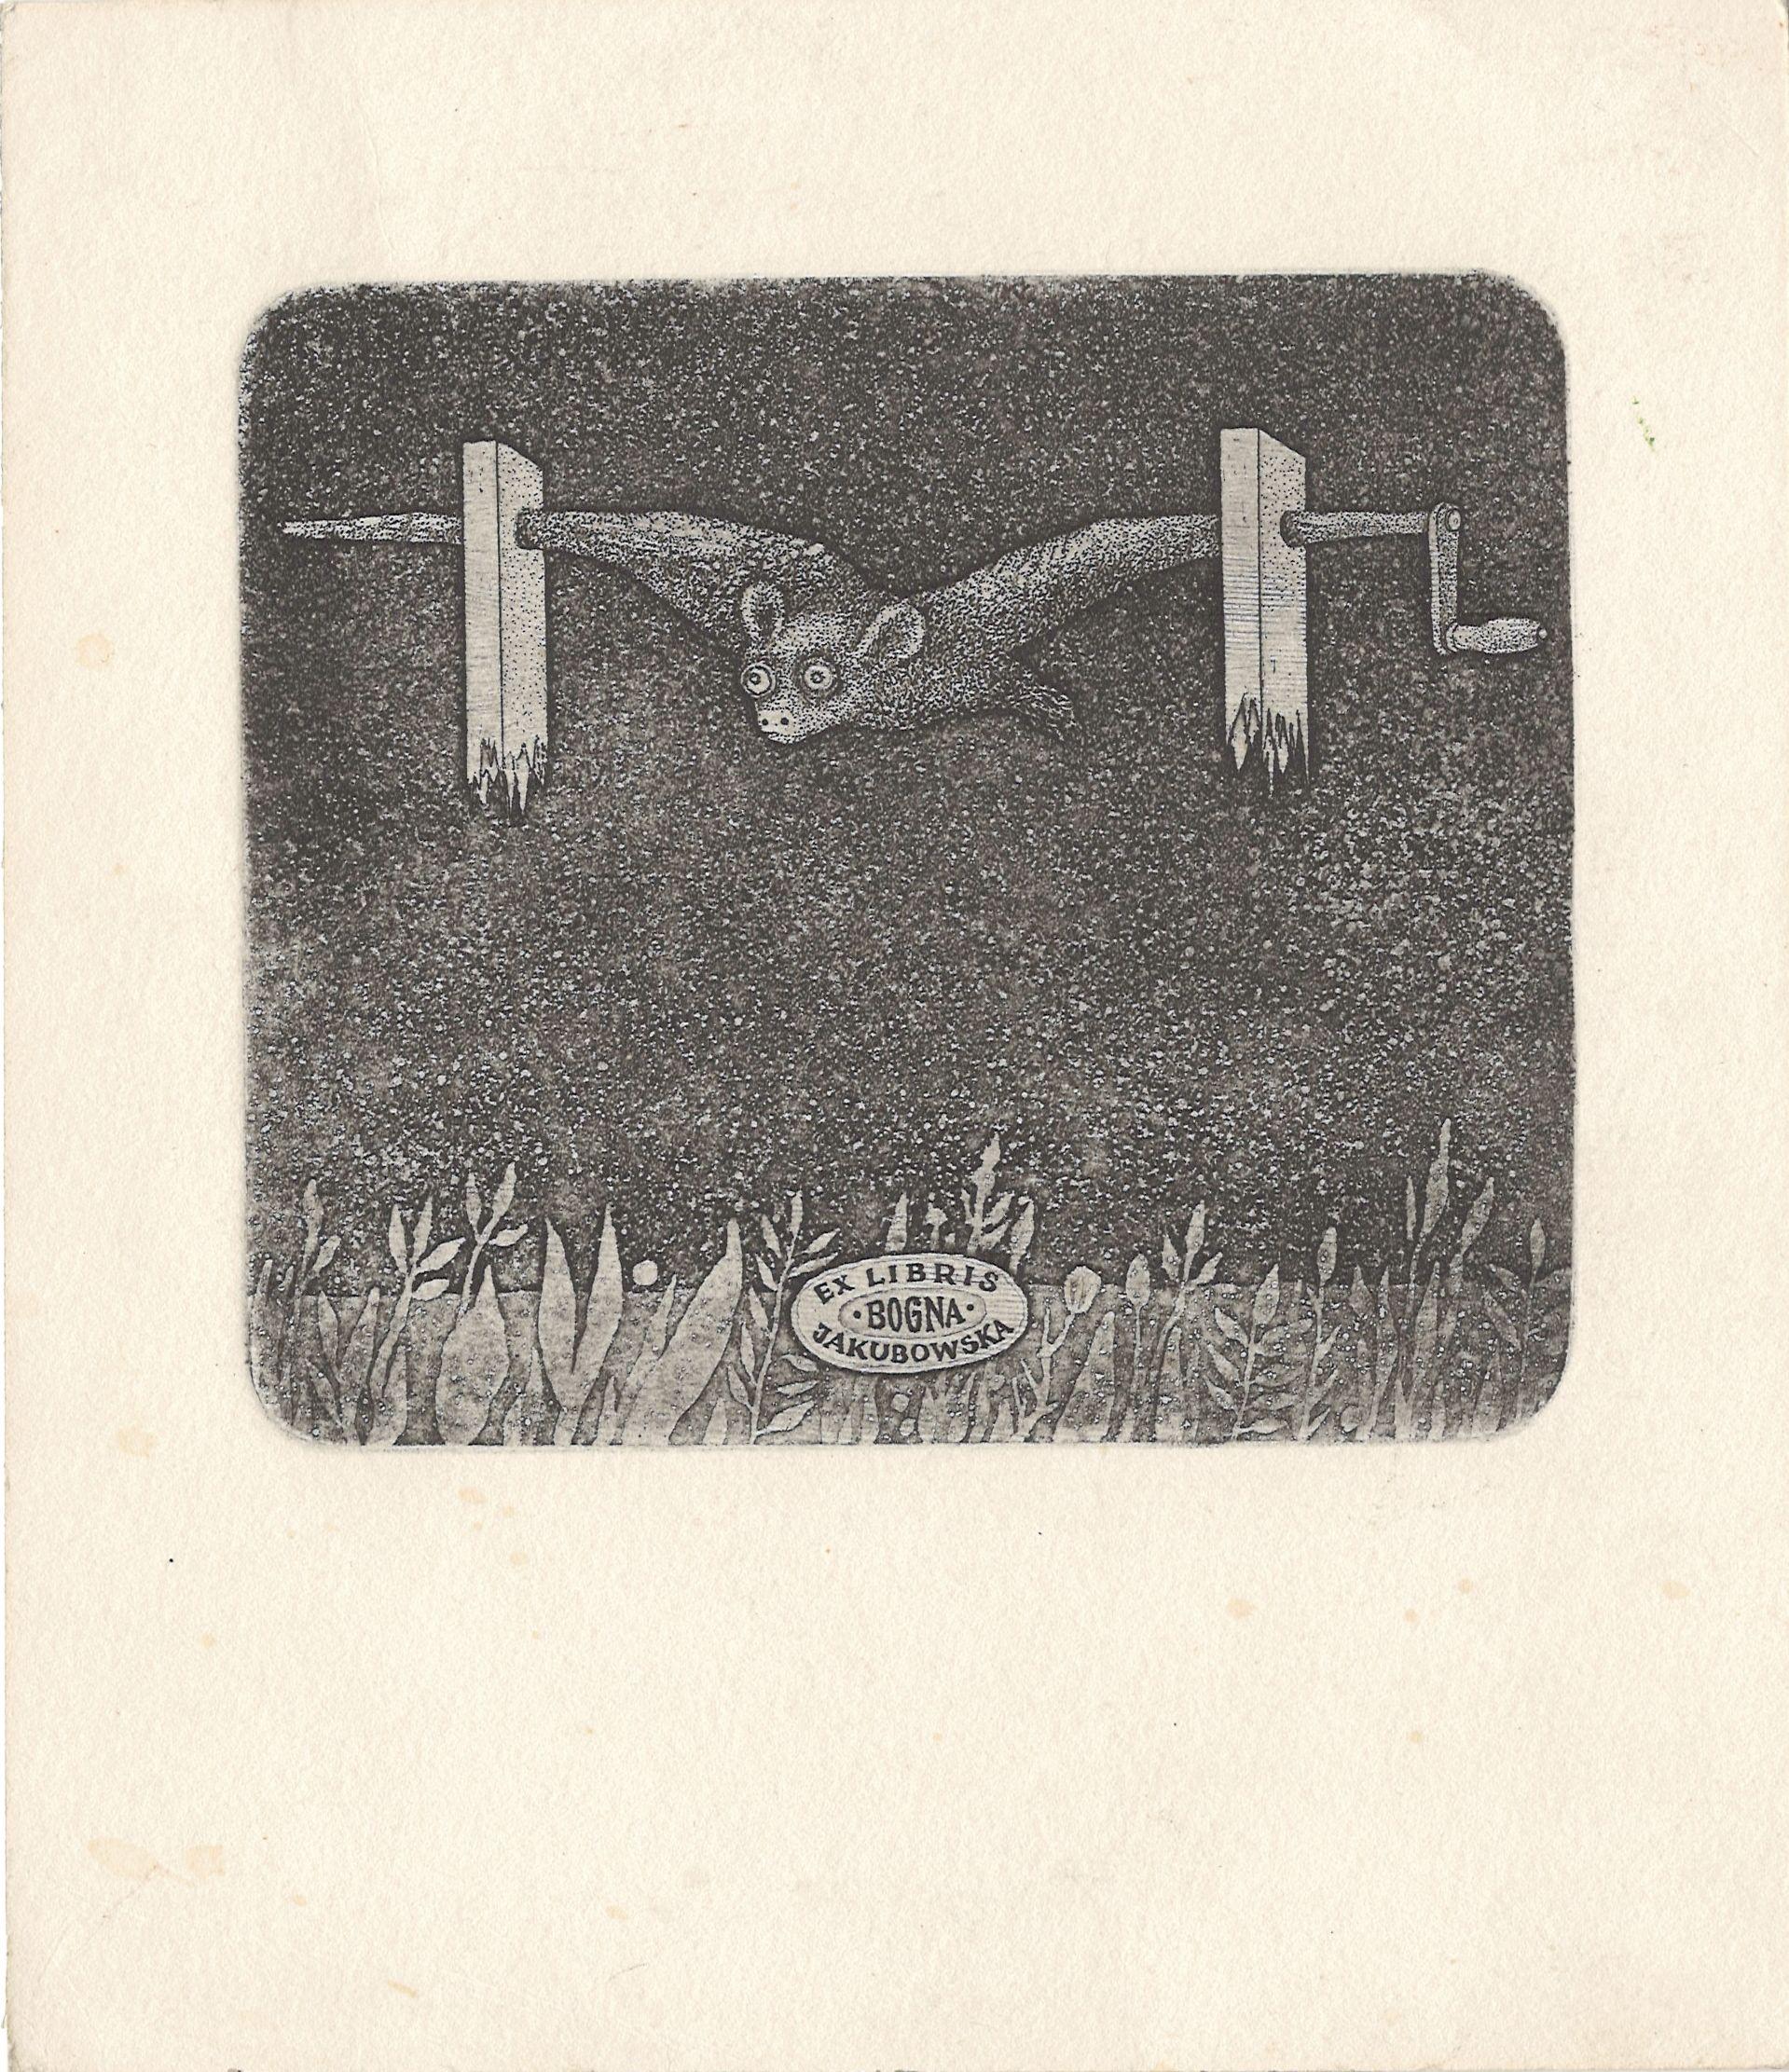 "Графіка. Екслібрис. ""Ex libris Bogna Jakubowski"" Стасиса Ейдригевичуса"